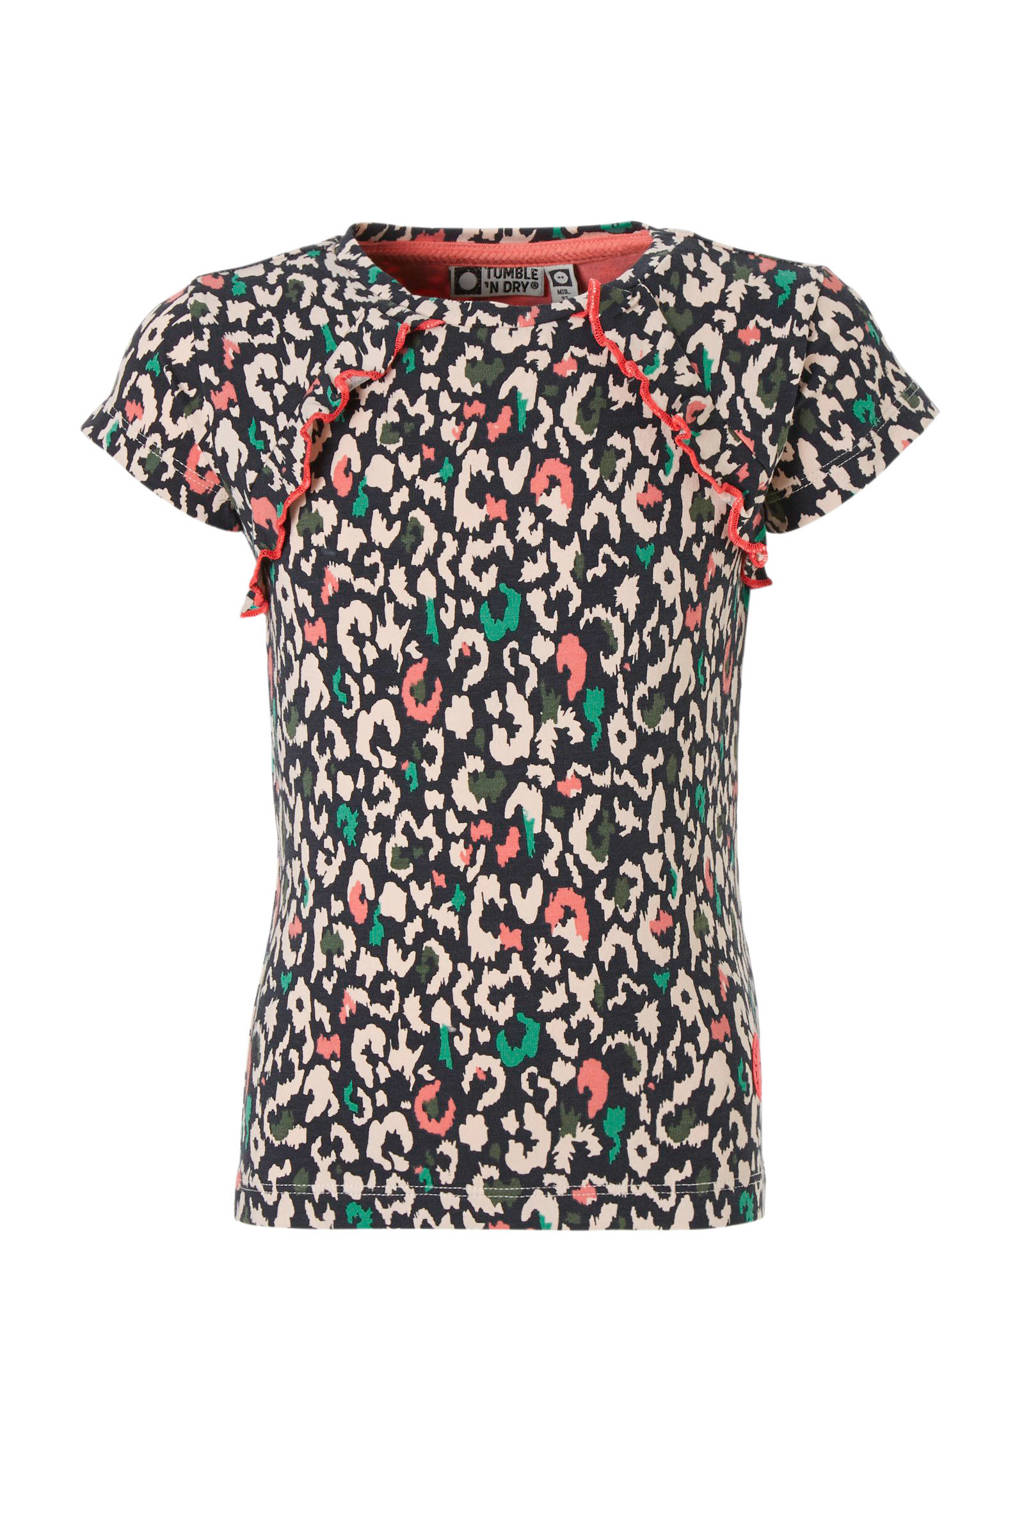 Tumble 'n Dry Mid T-shirt Celpe met panterprint en ruches, Zalm/antraciet/groen